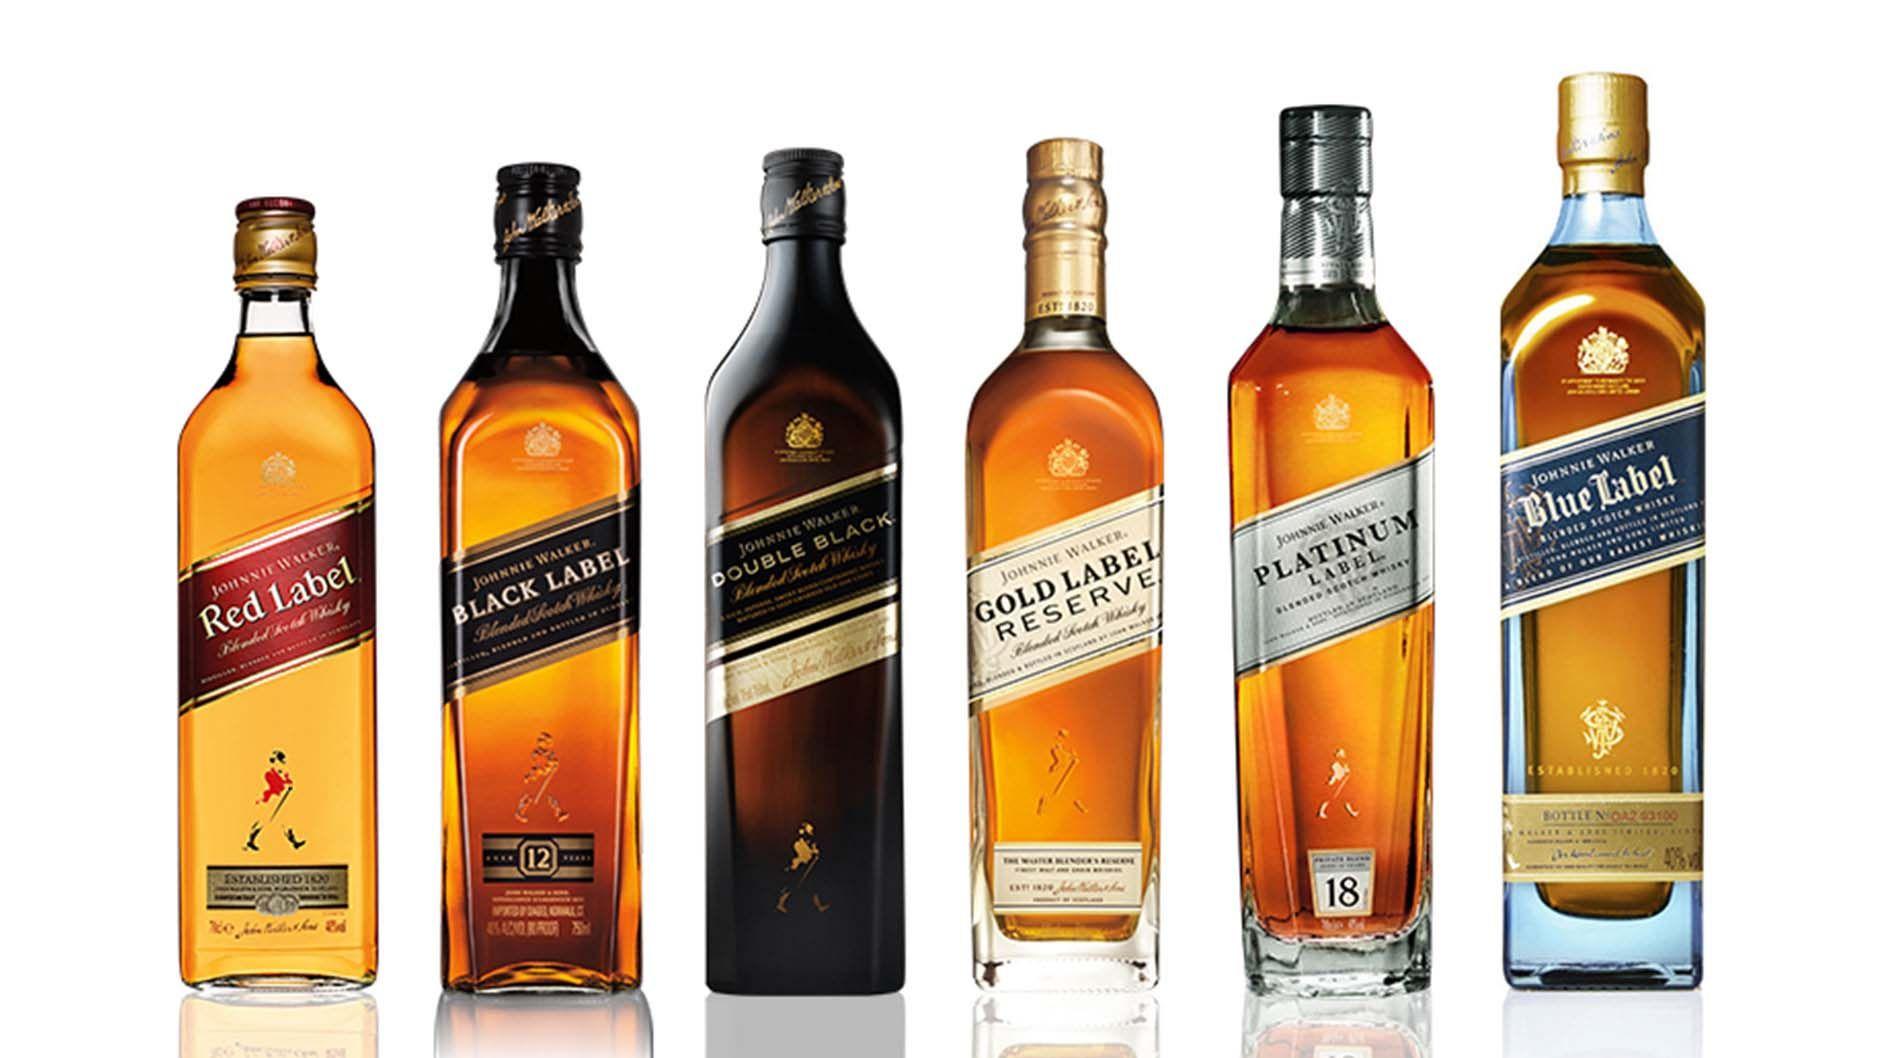 Bottle Of Johnnie Walker Colour Whisky Range Met Afbeeldingen